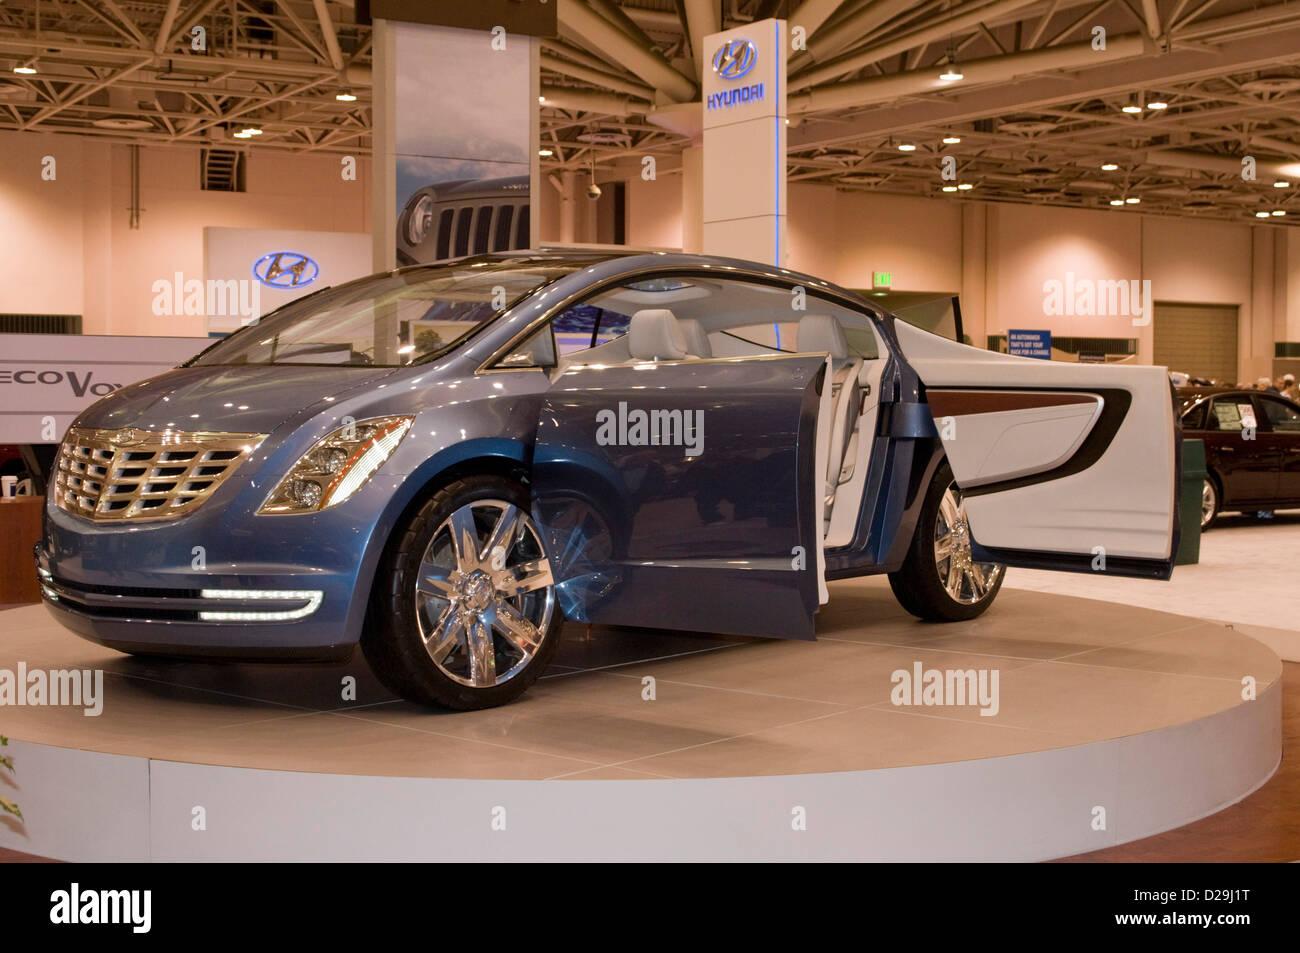 Chrysler concept car - Stock Image